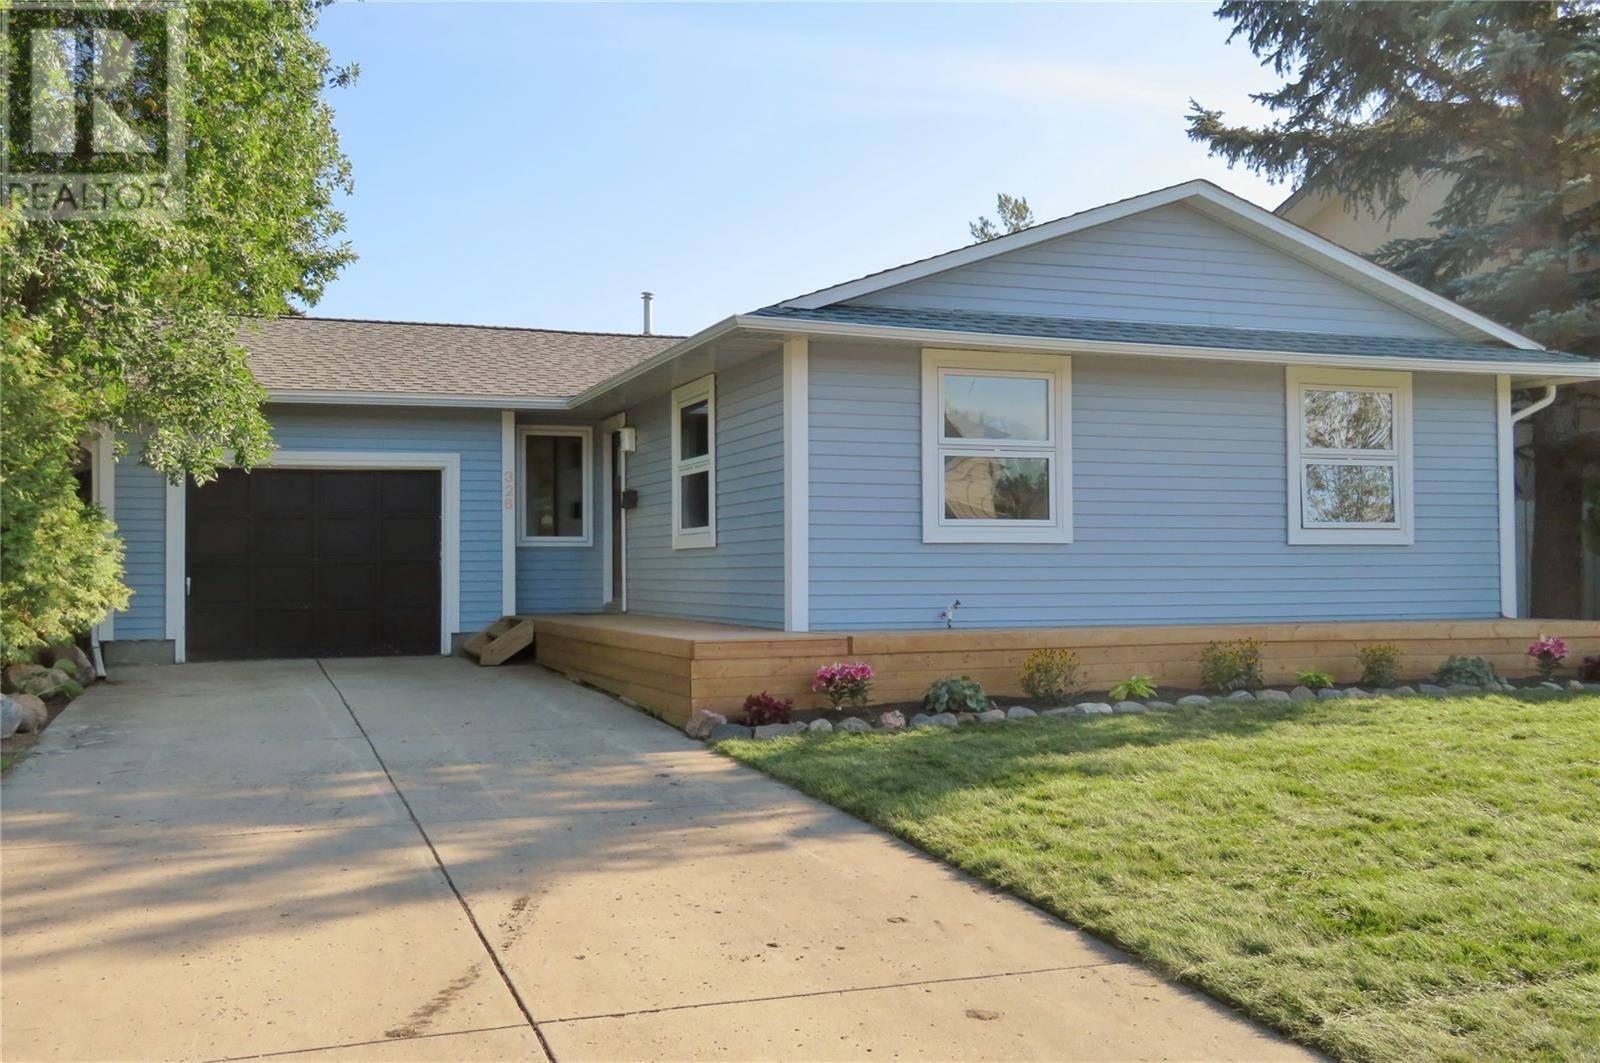 House for sale at 326 Laval Cres Saskatoon Saskatchewan - MLS: SK784159